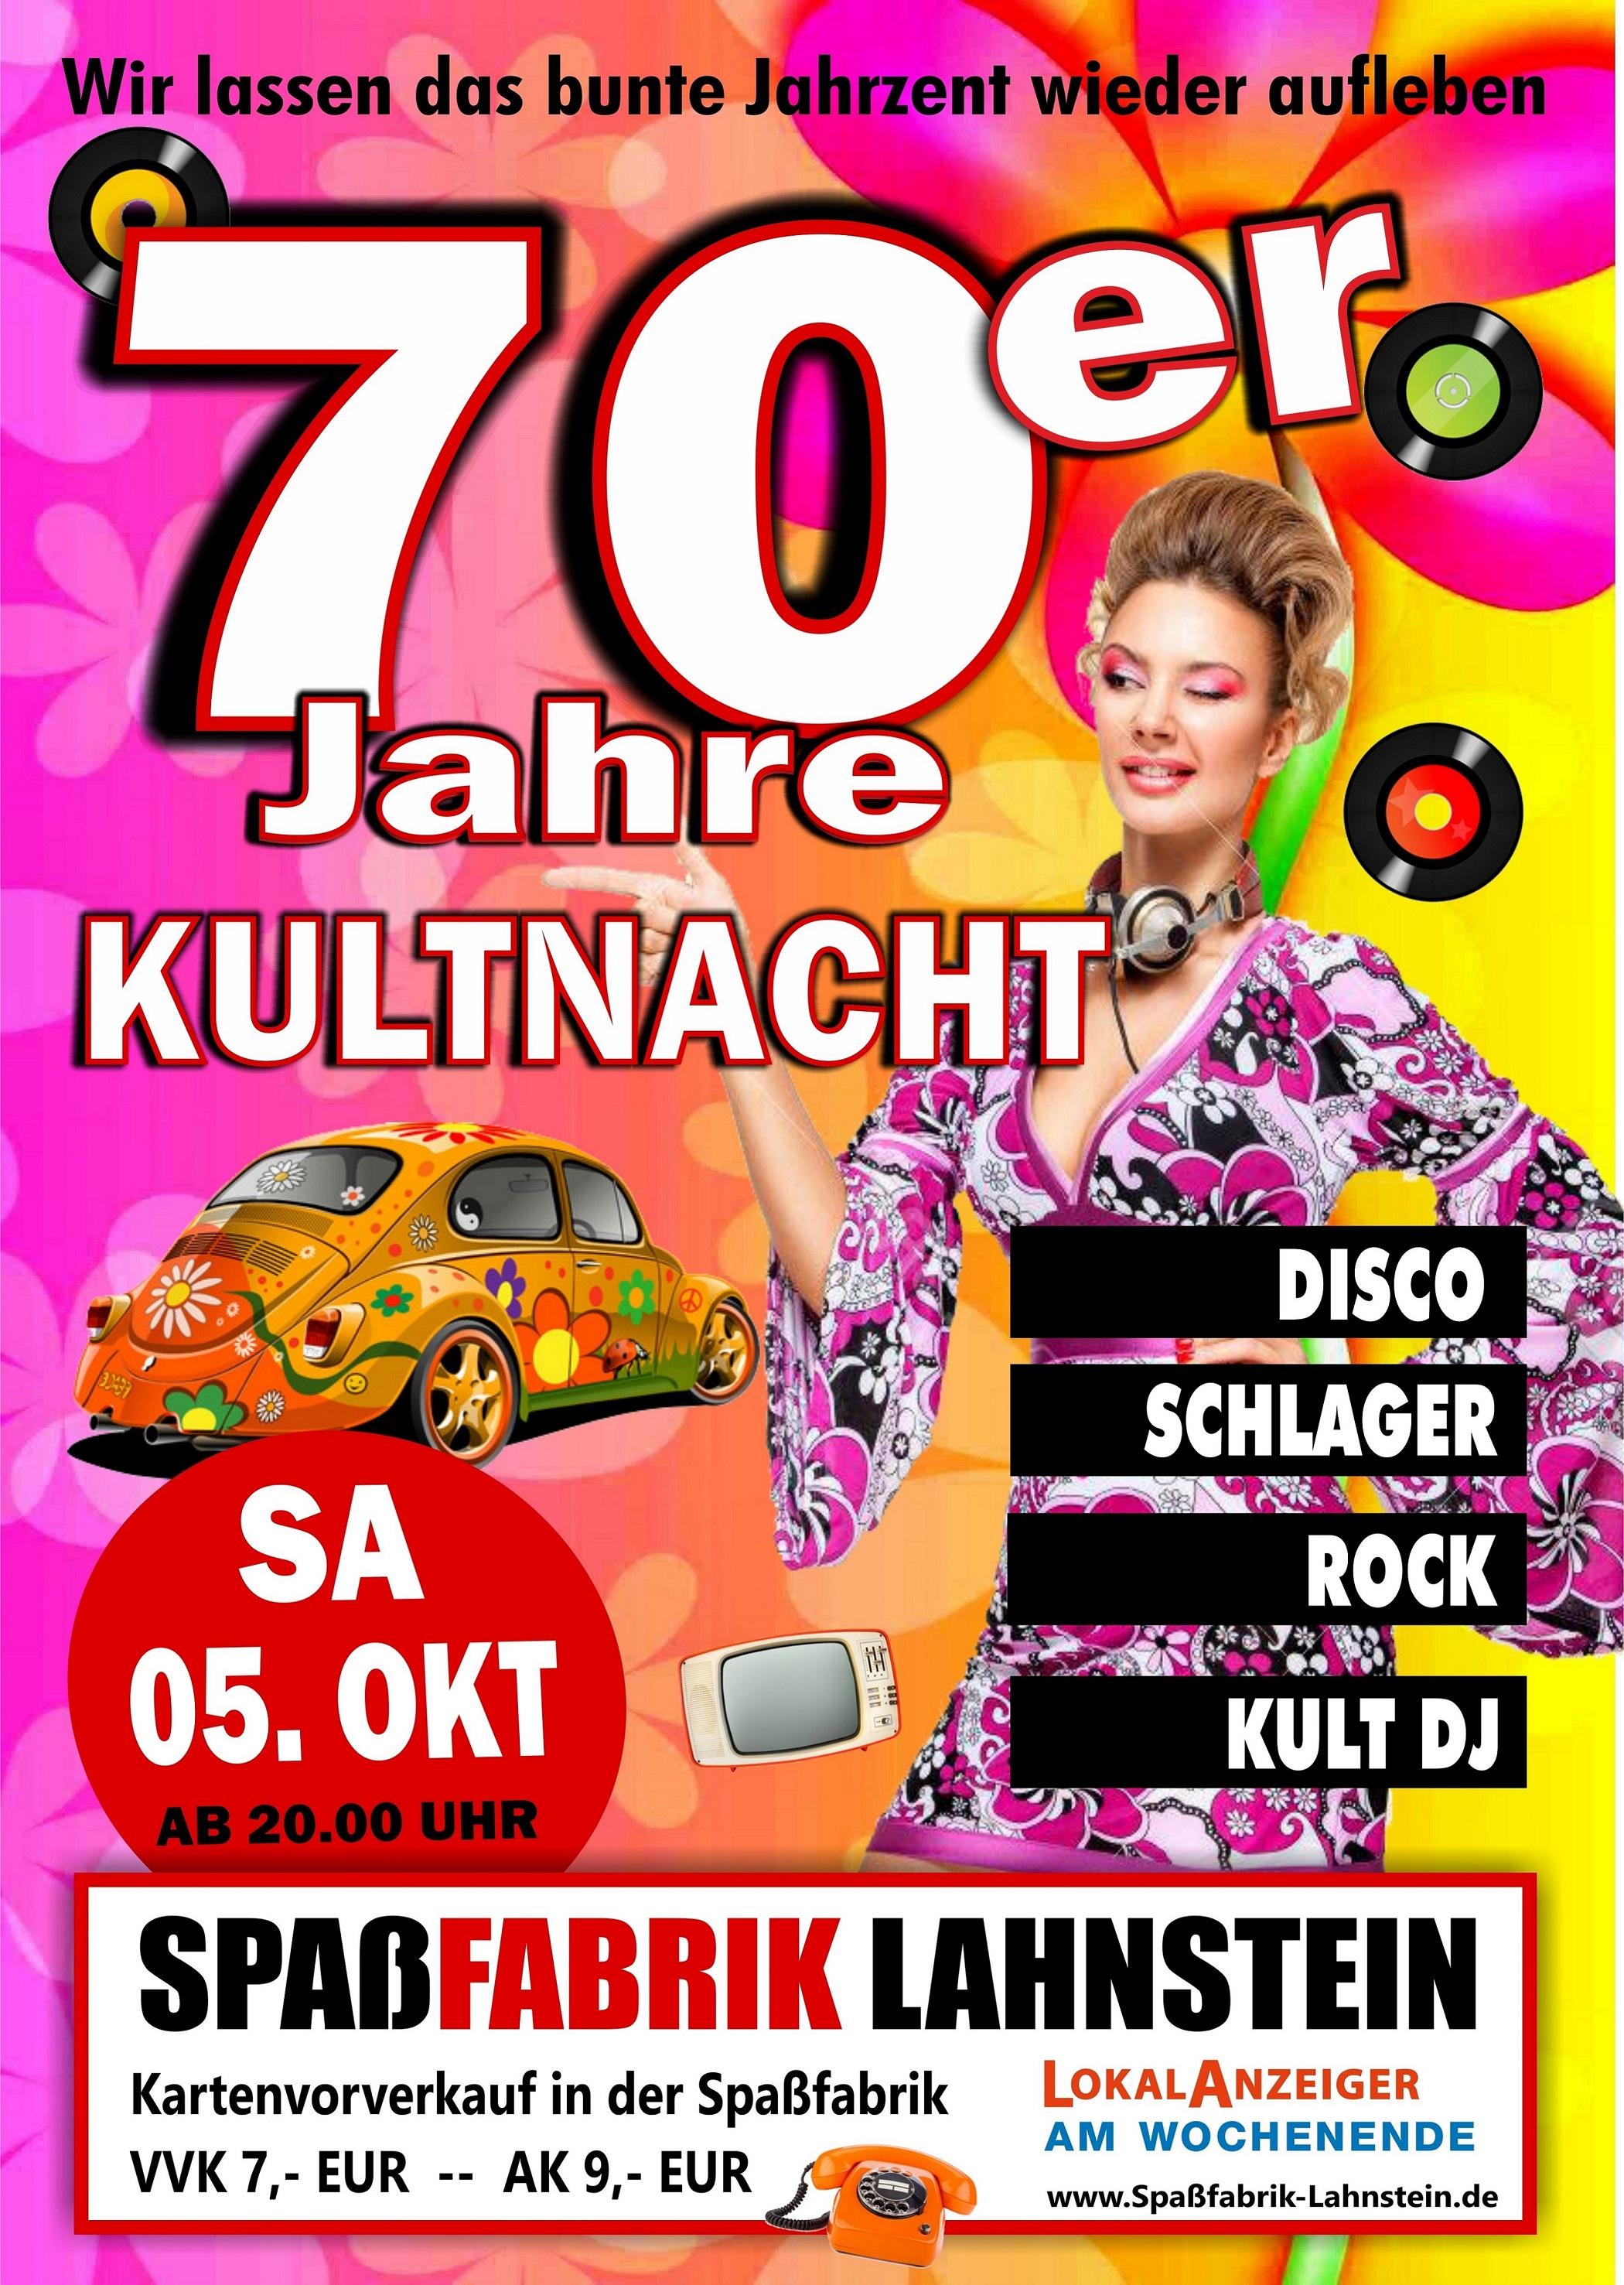 Spaßfabrik 70er Party 2019